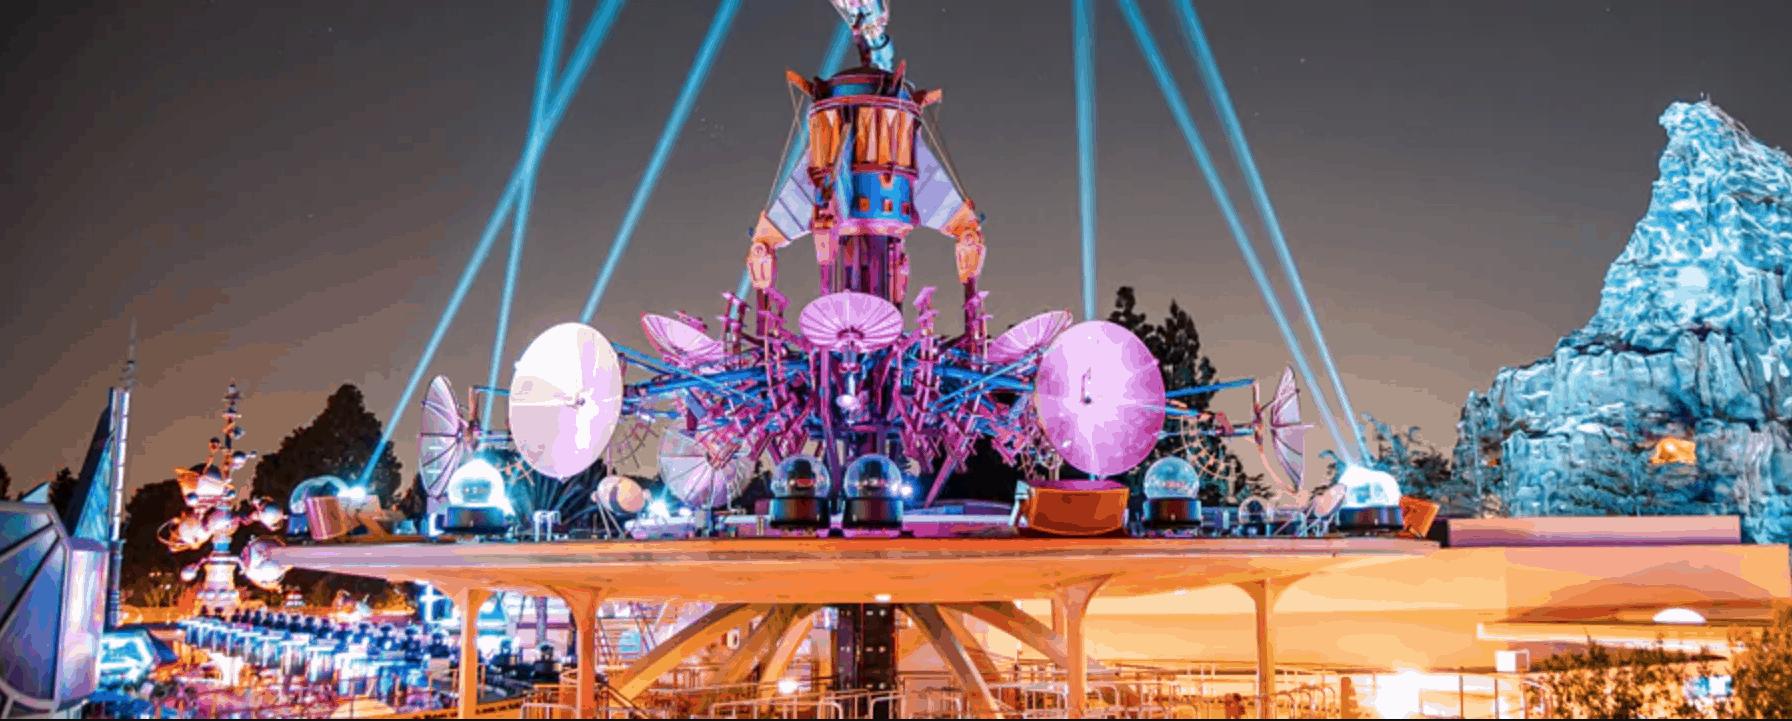 Tomorrowland Skyline Lounge Experience in Disneyland